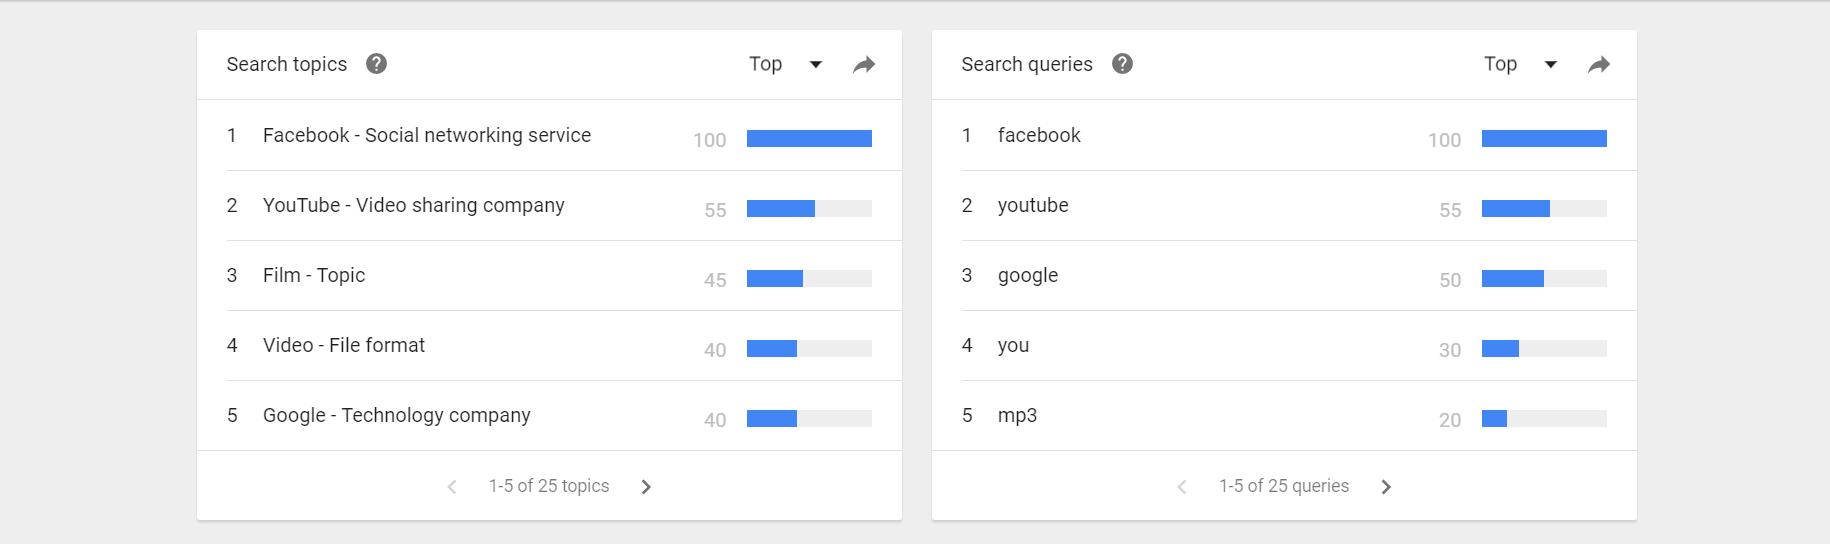 Example of chart showing trending topics worldwide.